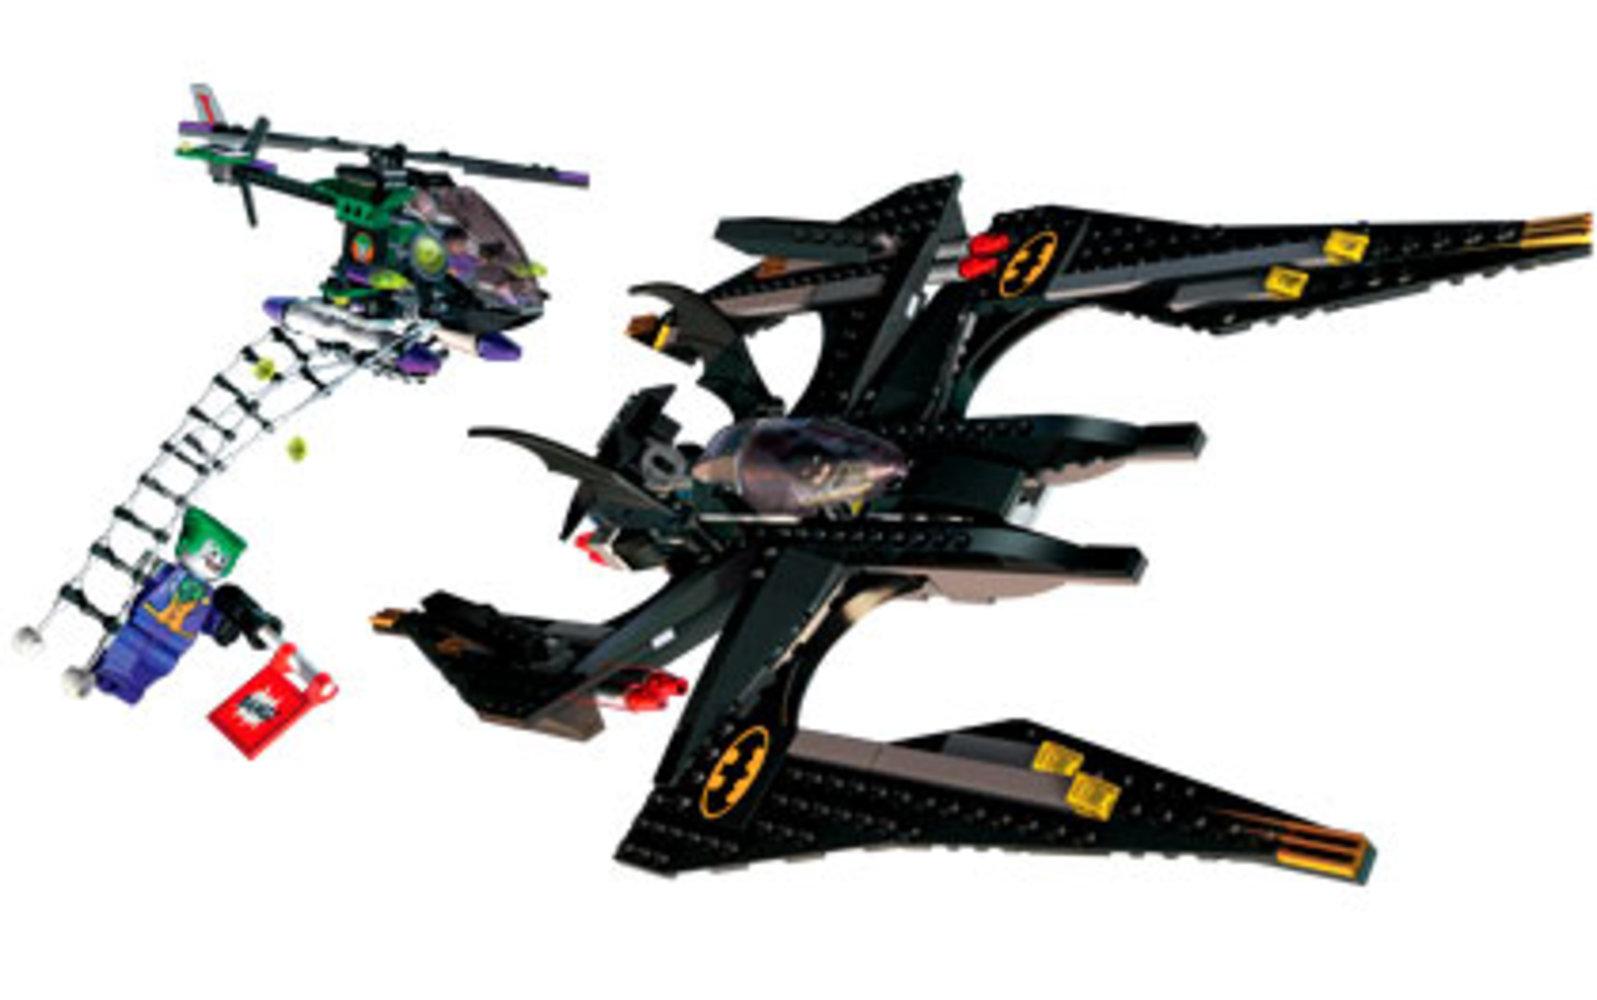 The Batwing: The Joker's Aerial Assault